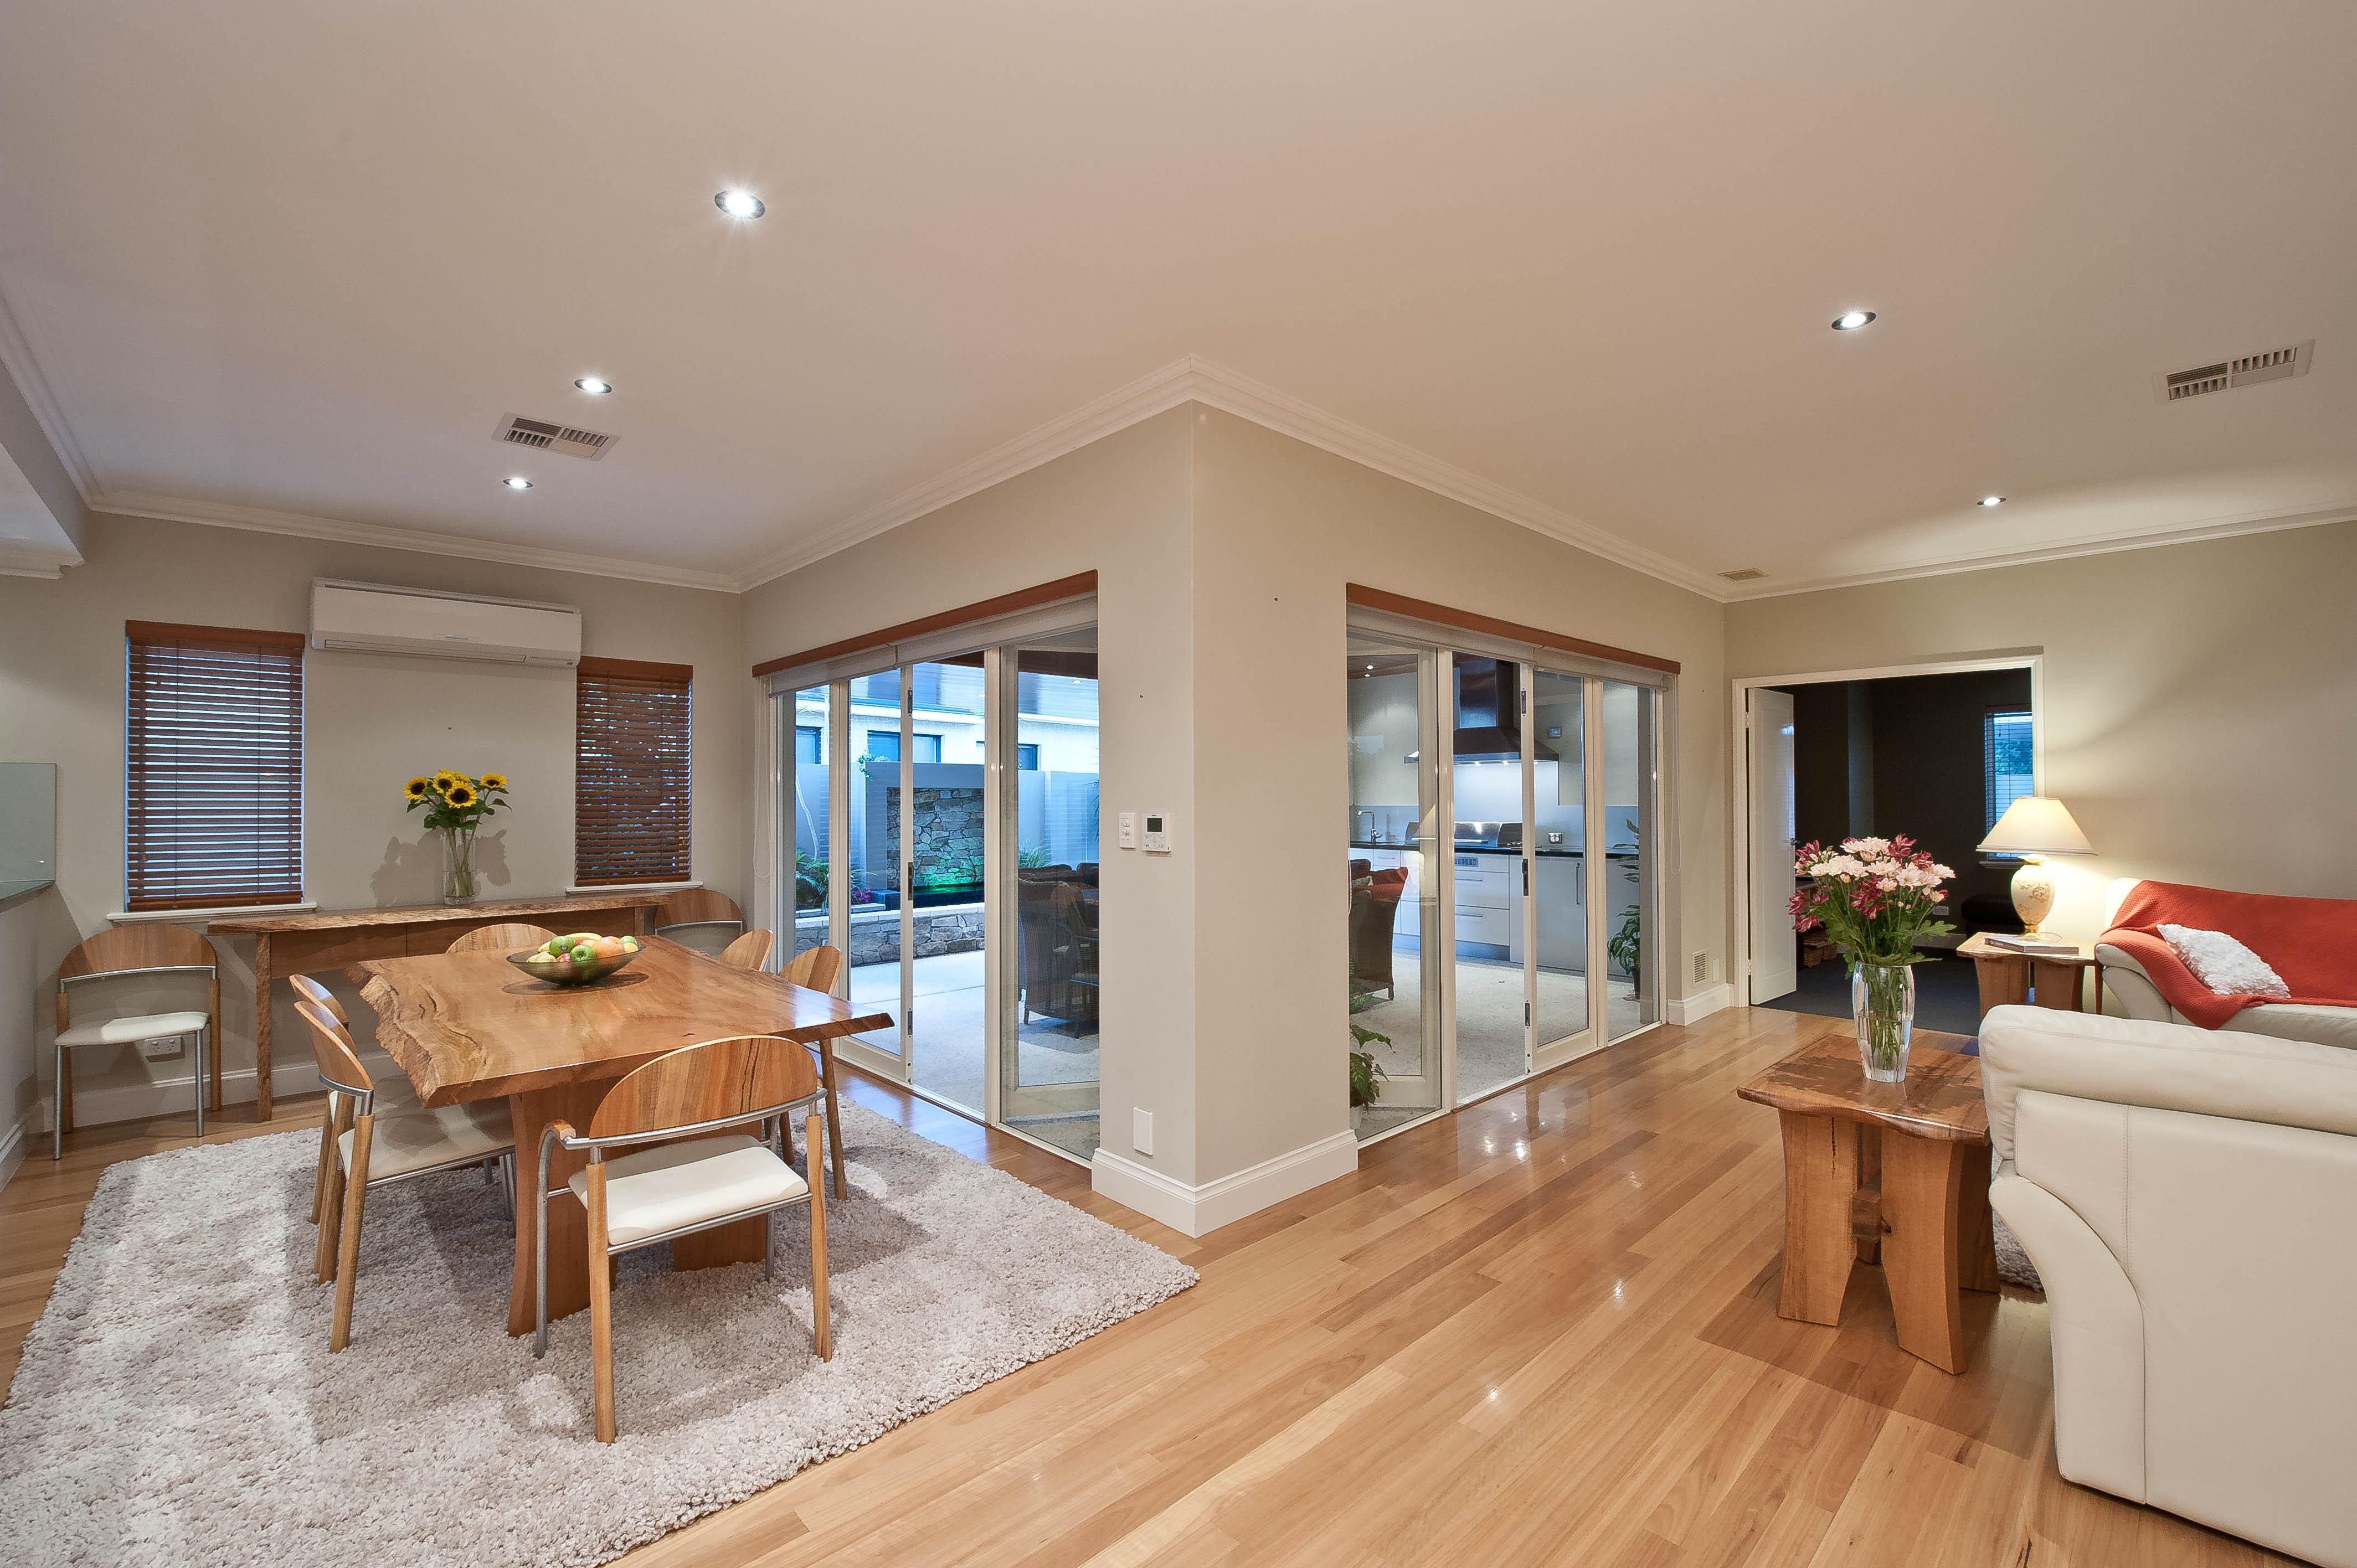 94 Interior Design Salary Perth